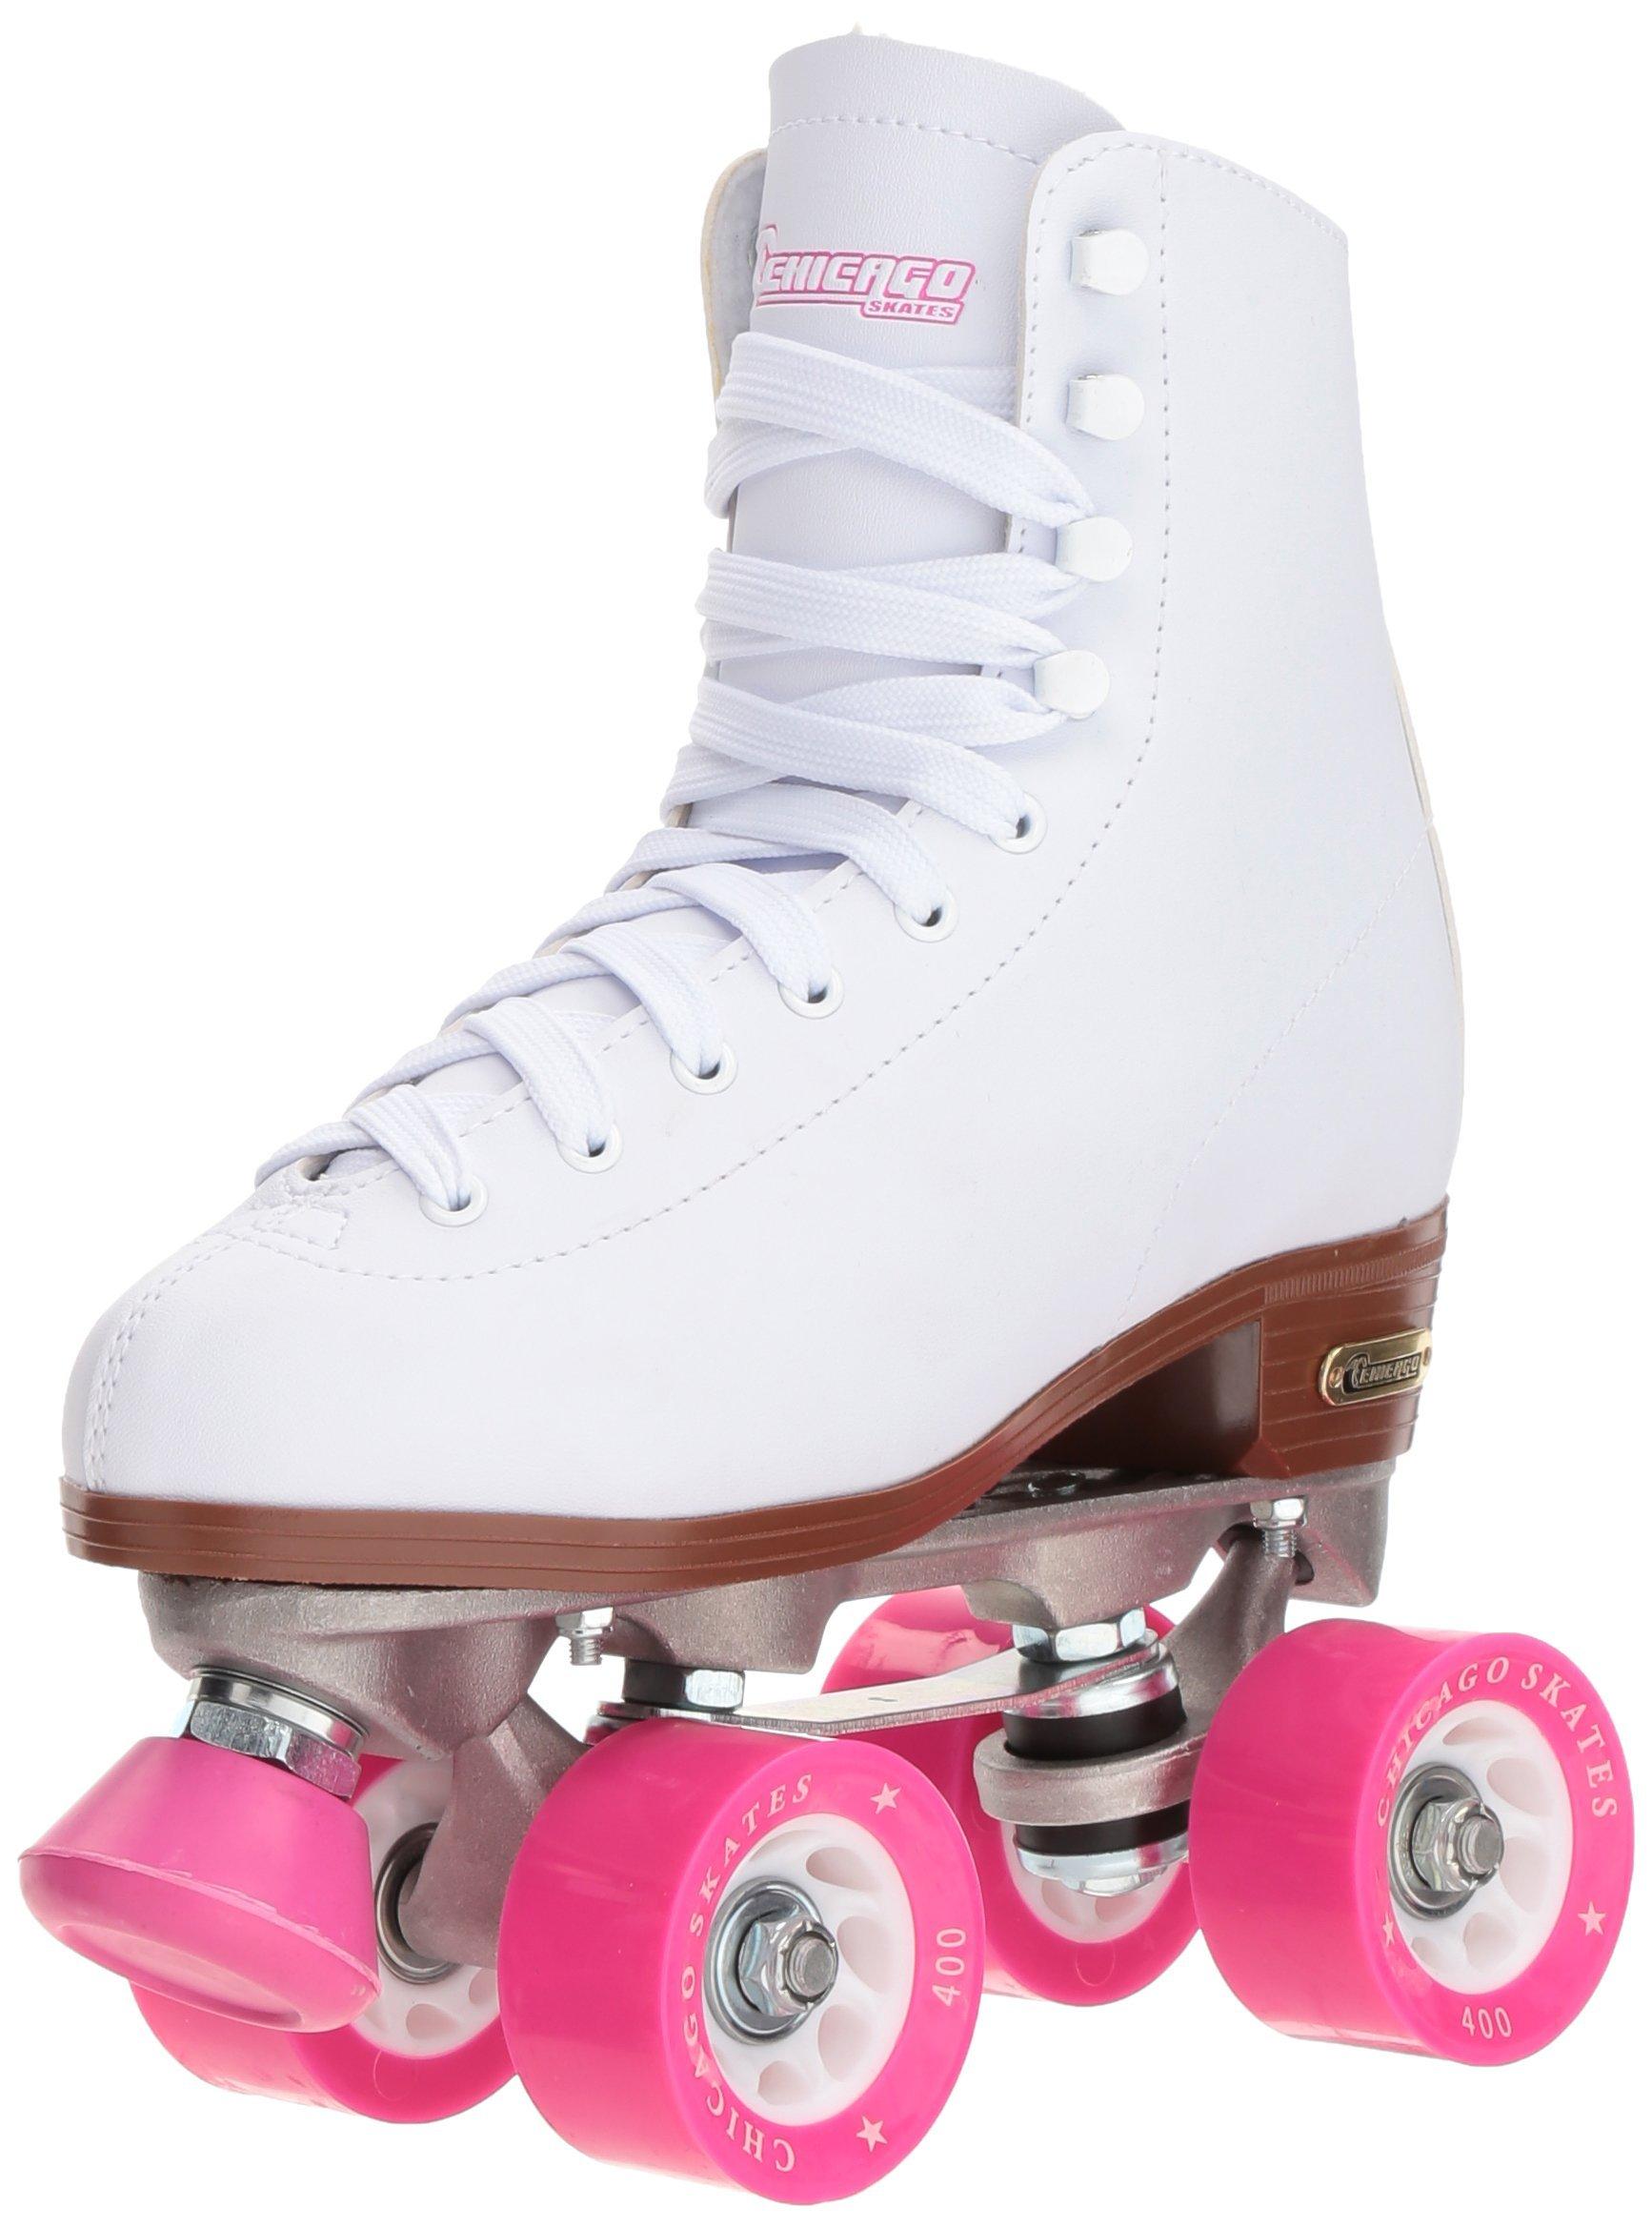 Chicago Women's Classic Roller Skates - White Rink Quad Skates - Size 9 (Renewed)